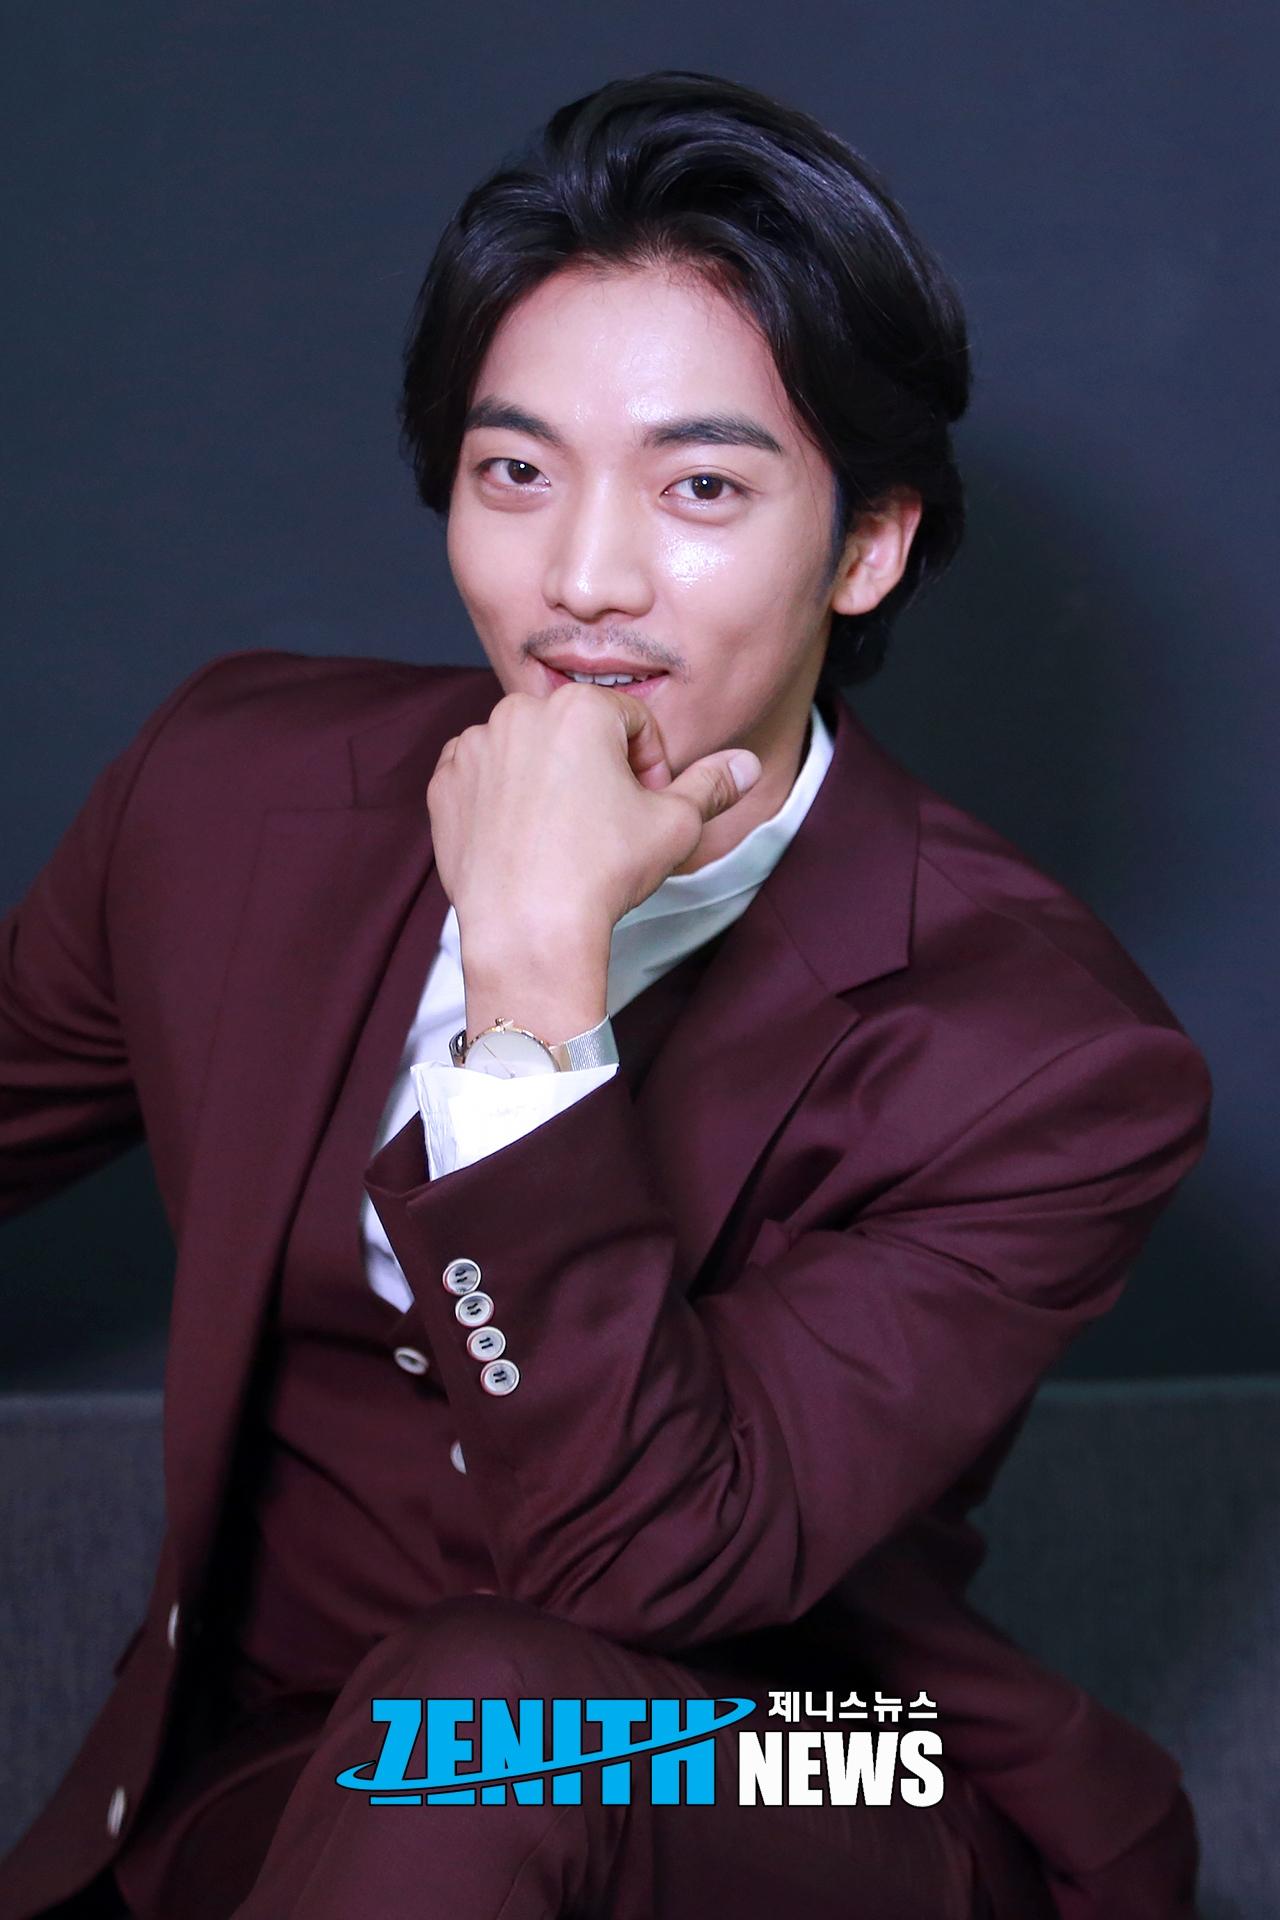 hwang hee song joong ki 2